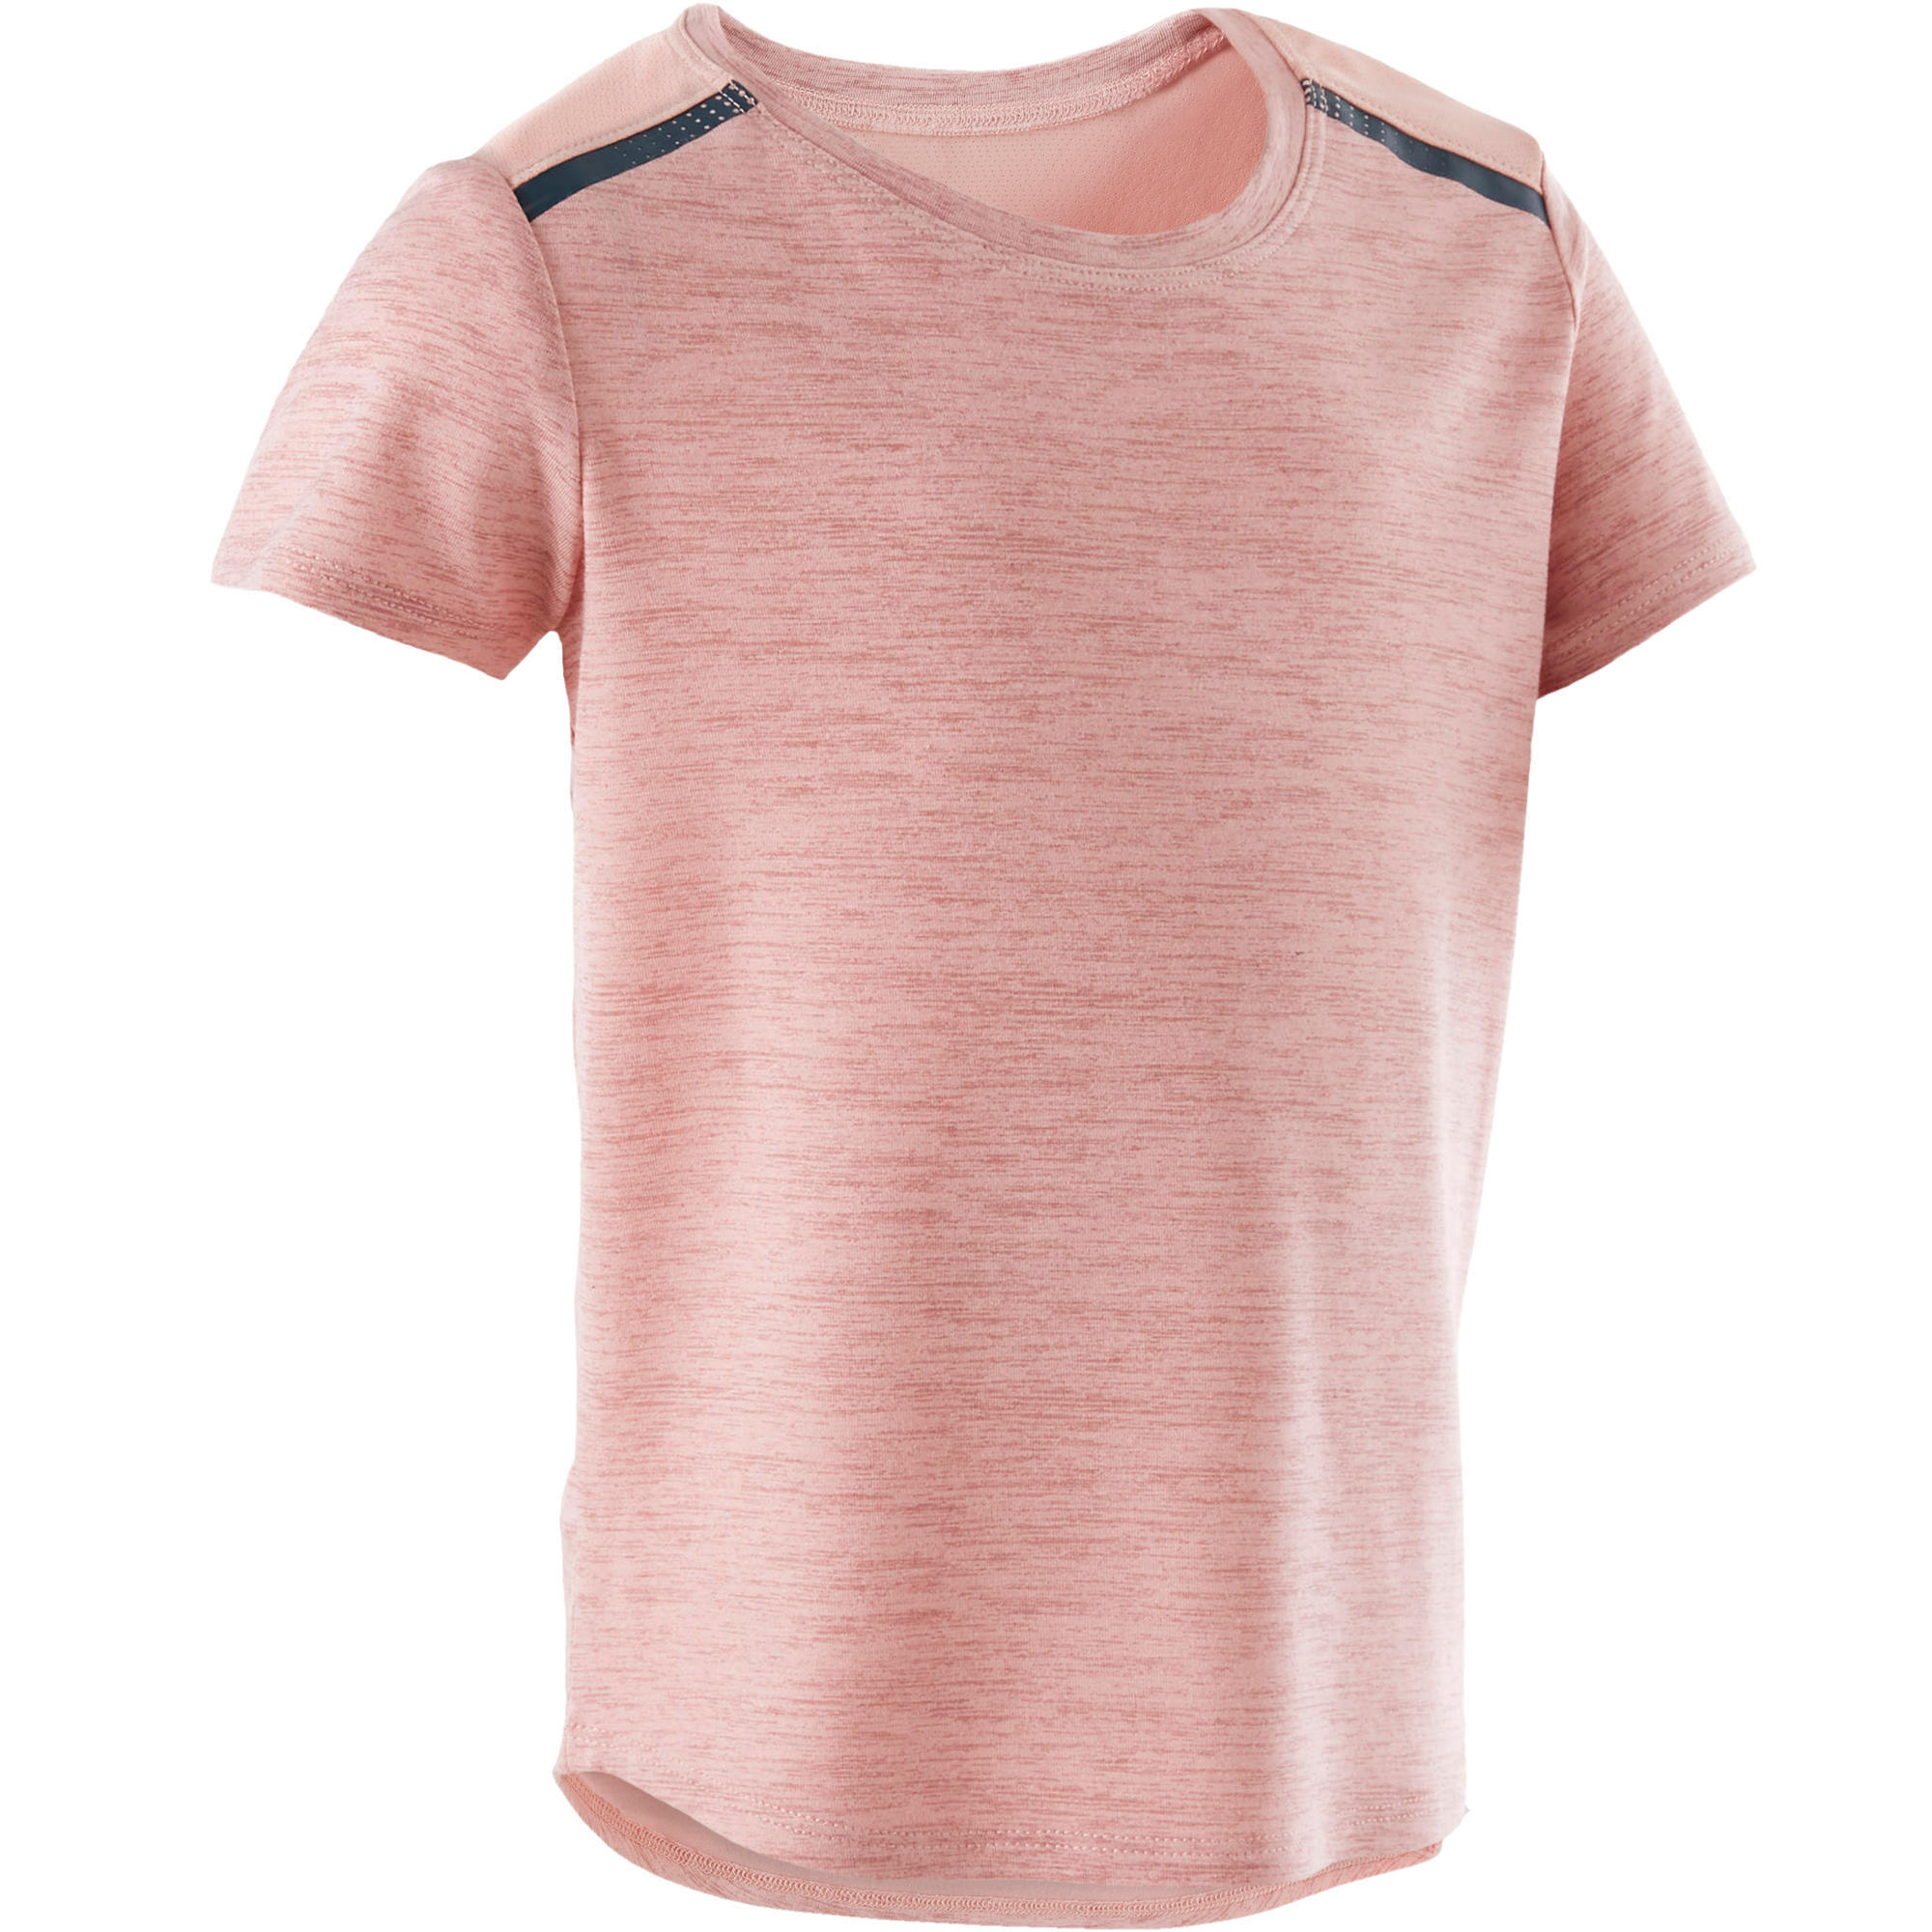 T shirt 500 baby gym fille et garçon rose domyos